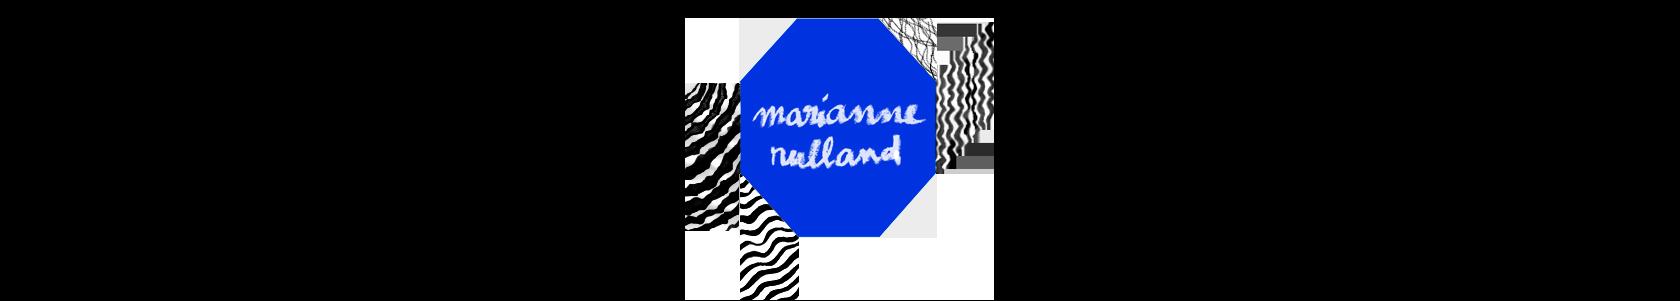 Marianne Rulland – Graphiste print et textile, illustratrice